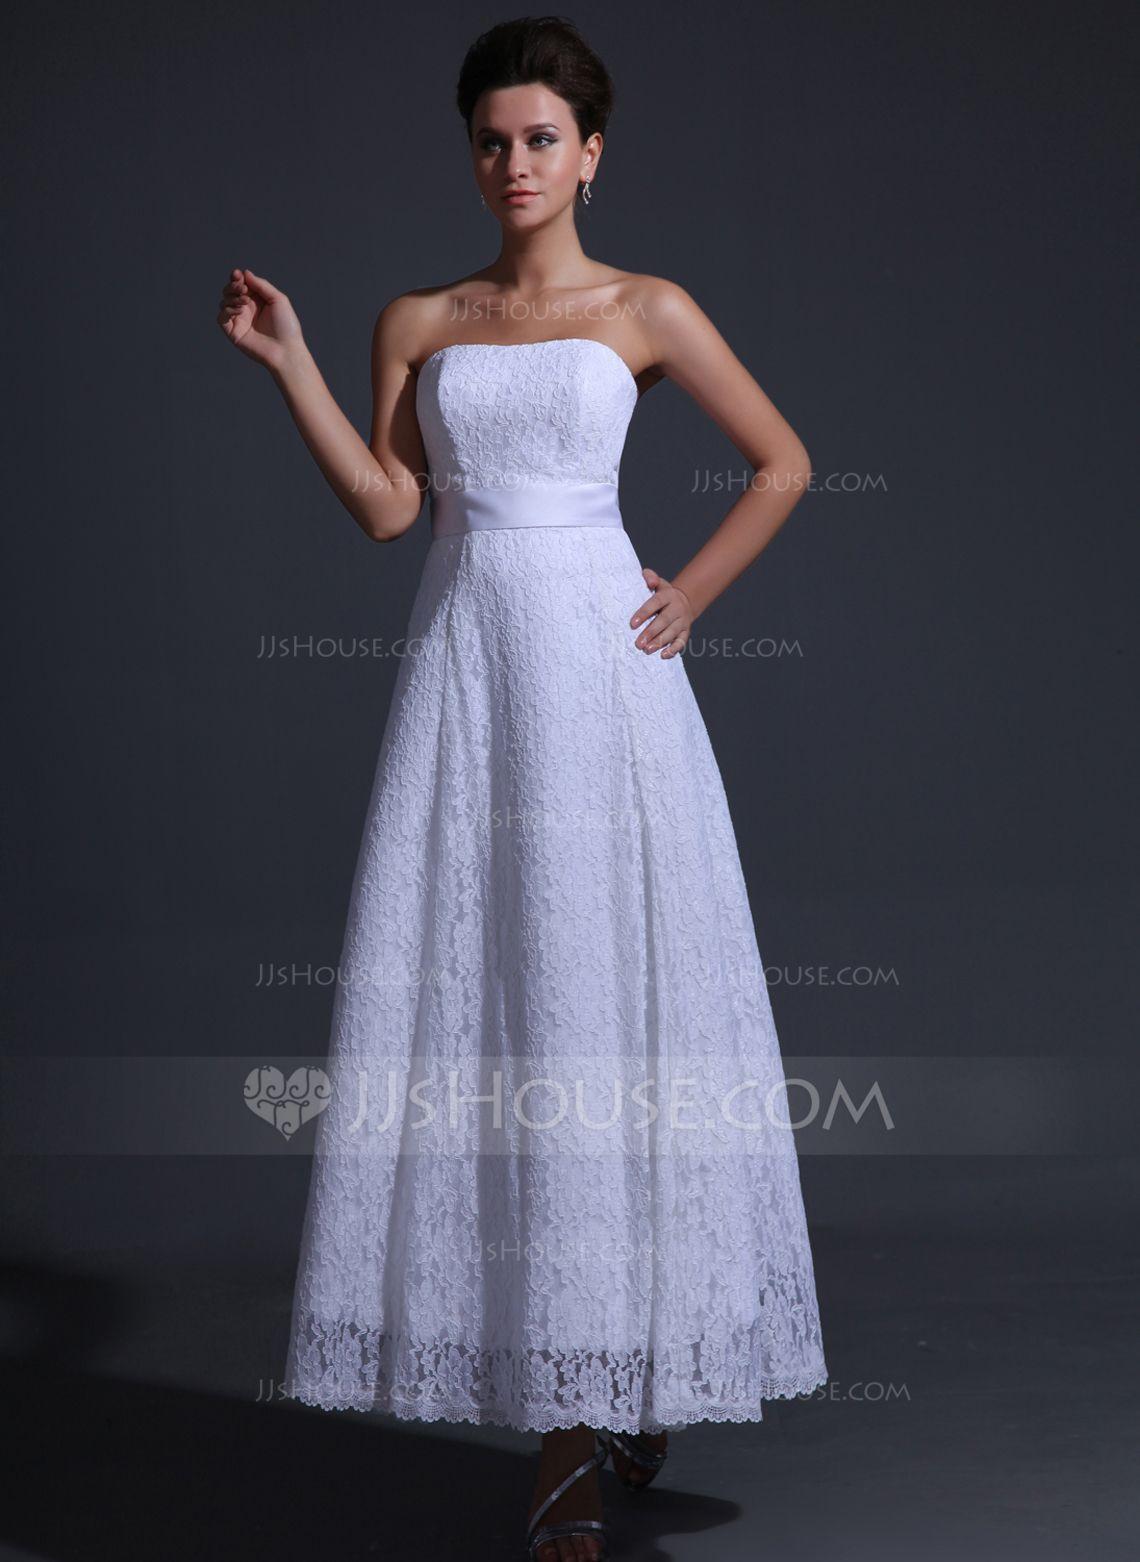 Alineprincess strapless anklelength charmeuse lace wedding dress